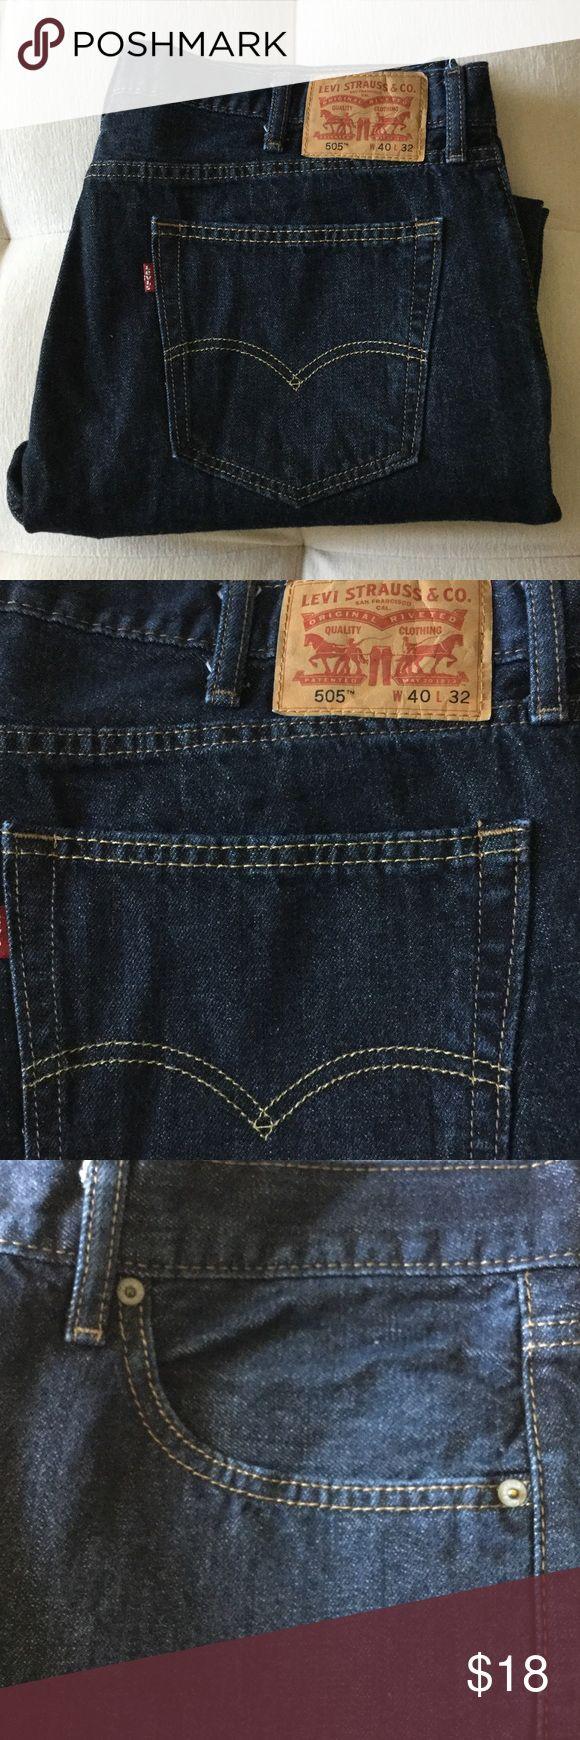 MENS LEVI STRAUSS 505 REGULAR FIT NWOT W 40 L 32 MENS LEVI STRAUSS 505 REGULAR FIT NWOT W 40 L 32 -  Excellent condition. Levi's Jeans